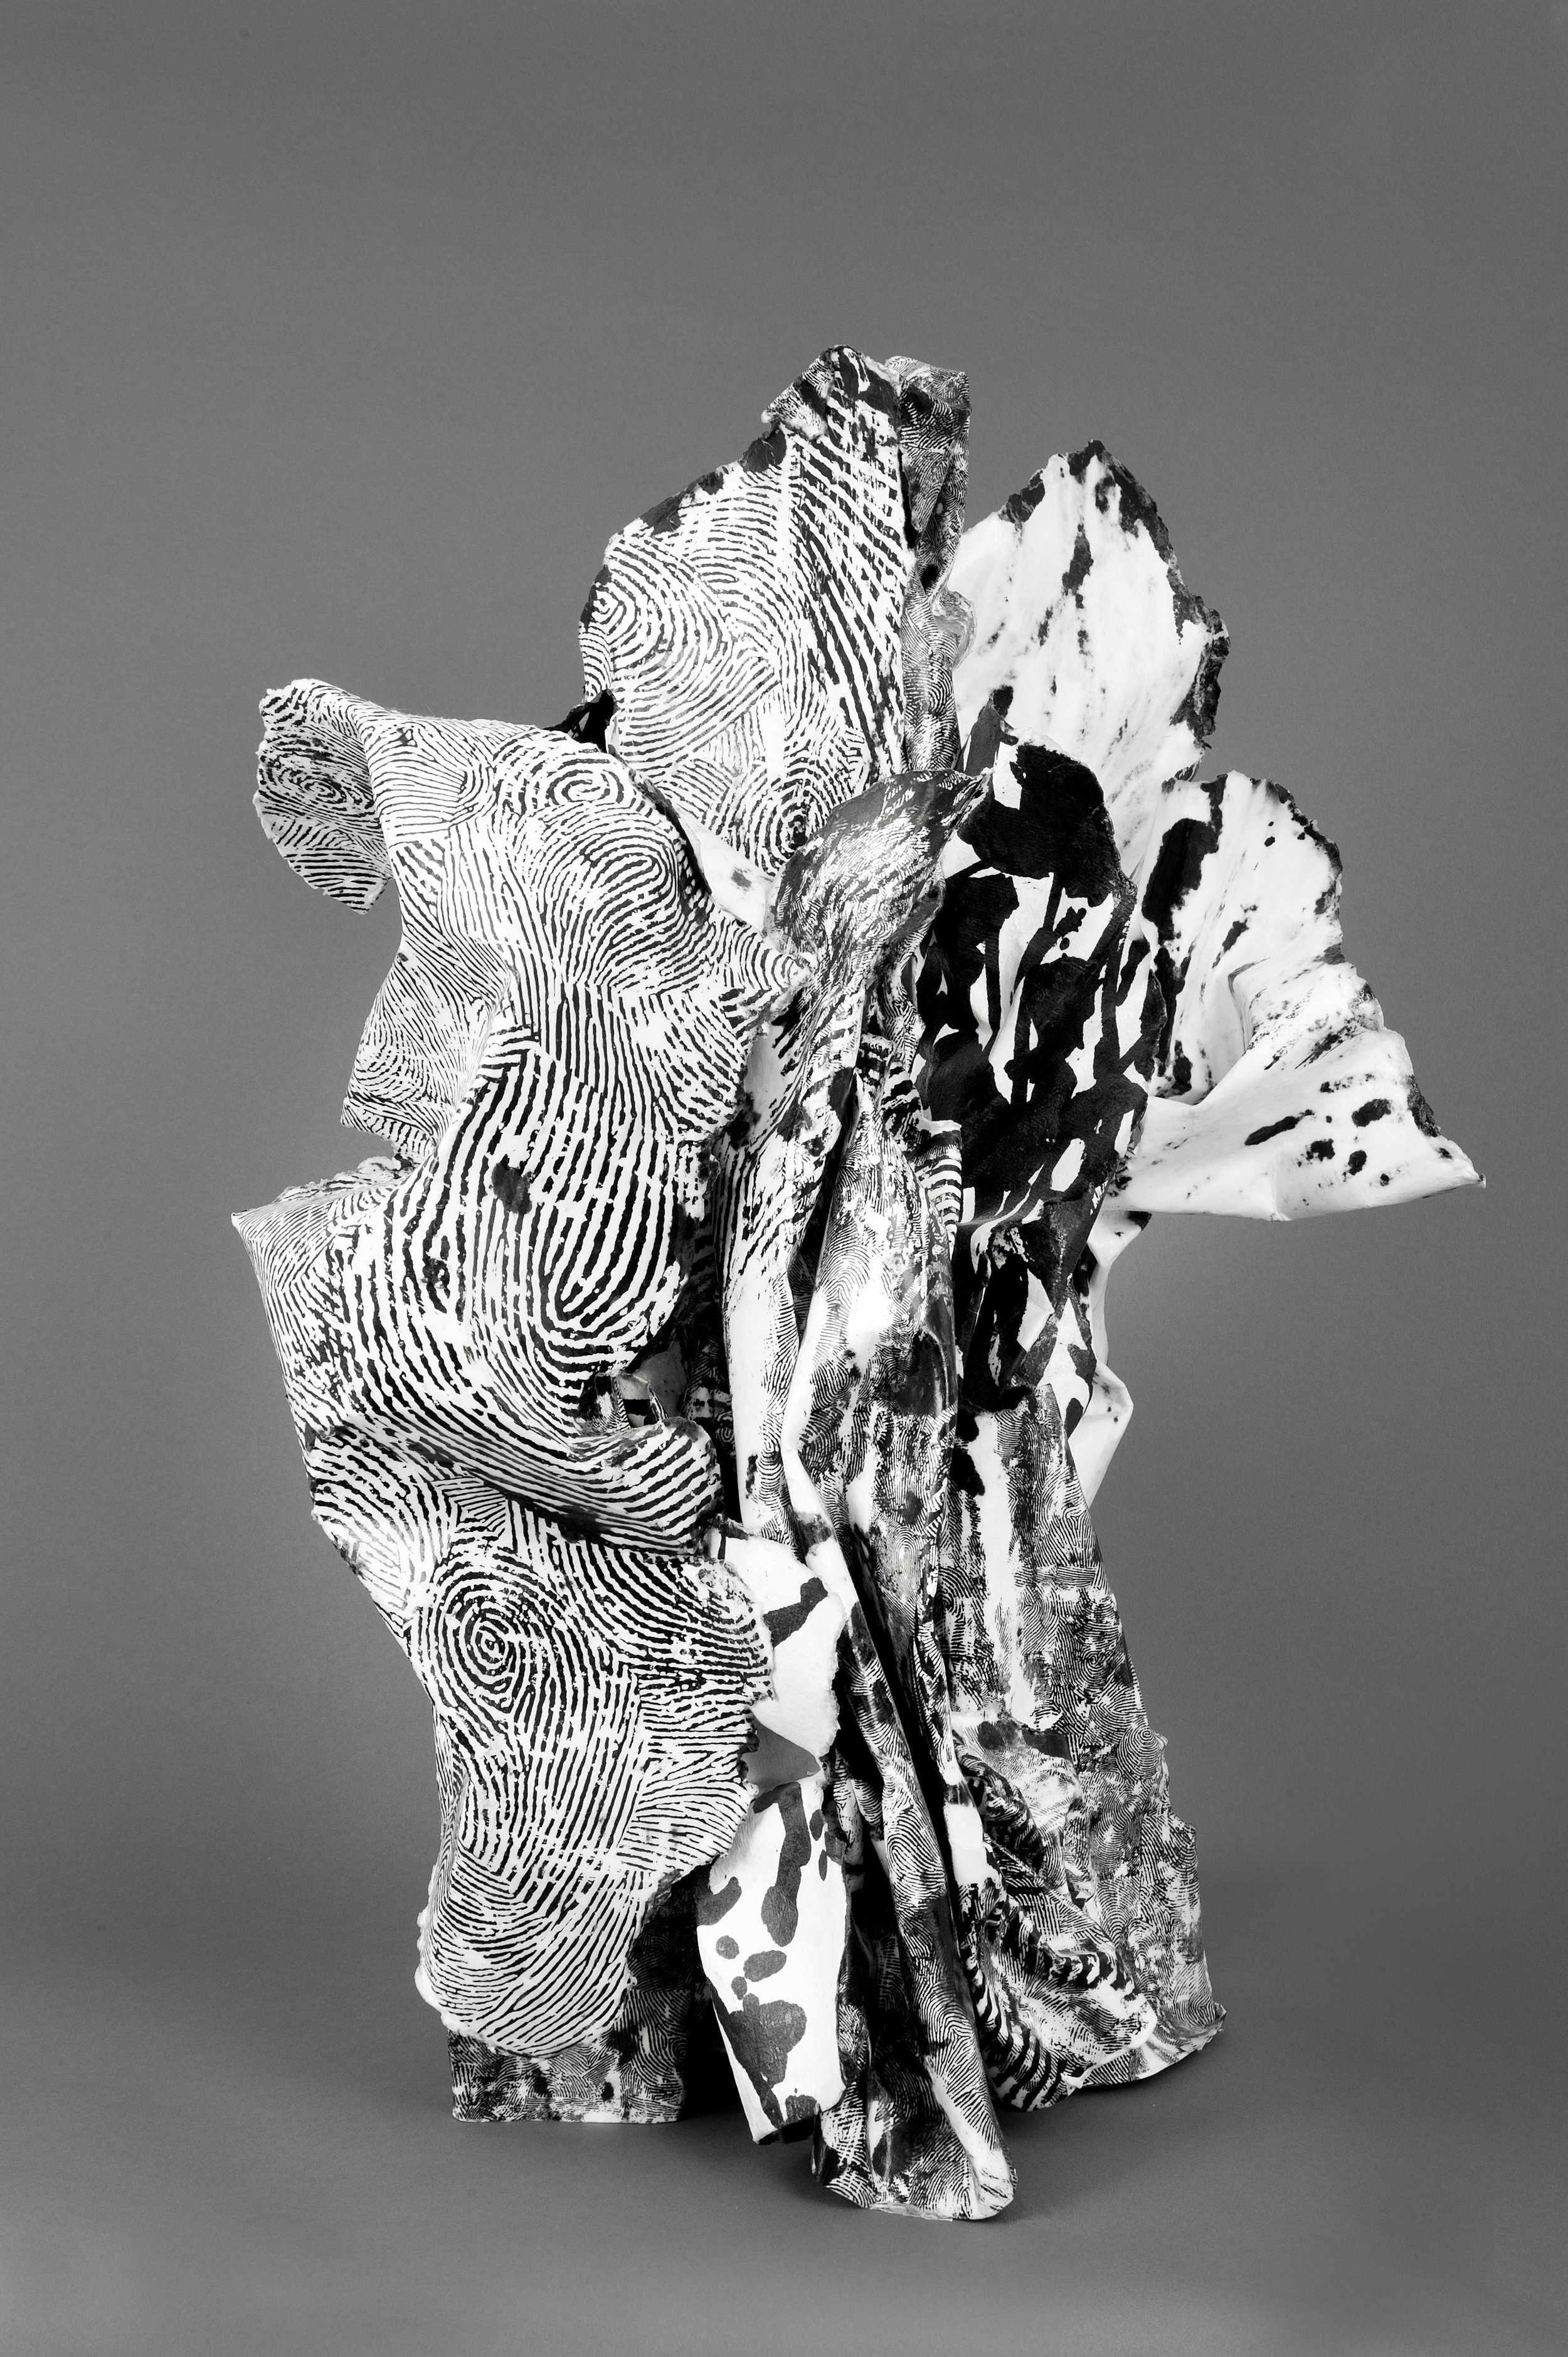 Hilda Shen,  RockStrata , 2003. Paper, Ink, wax, wood, 14 x 18 x 25 inches ©Hilda Shen, courtesy Fou Gallery